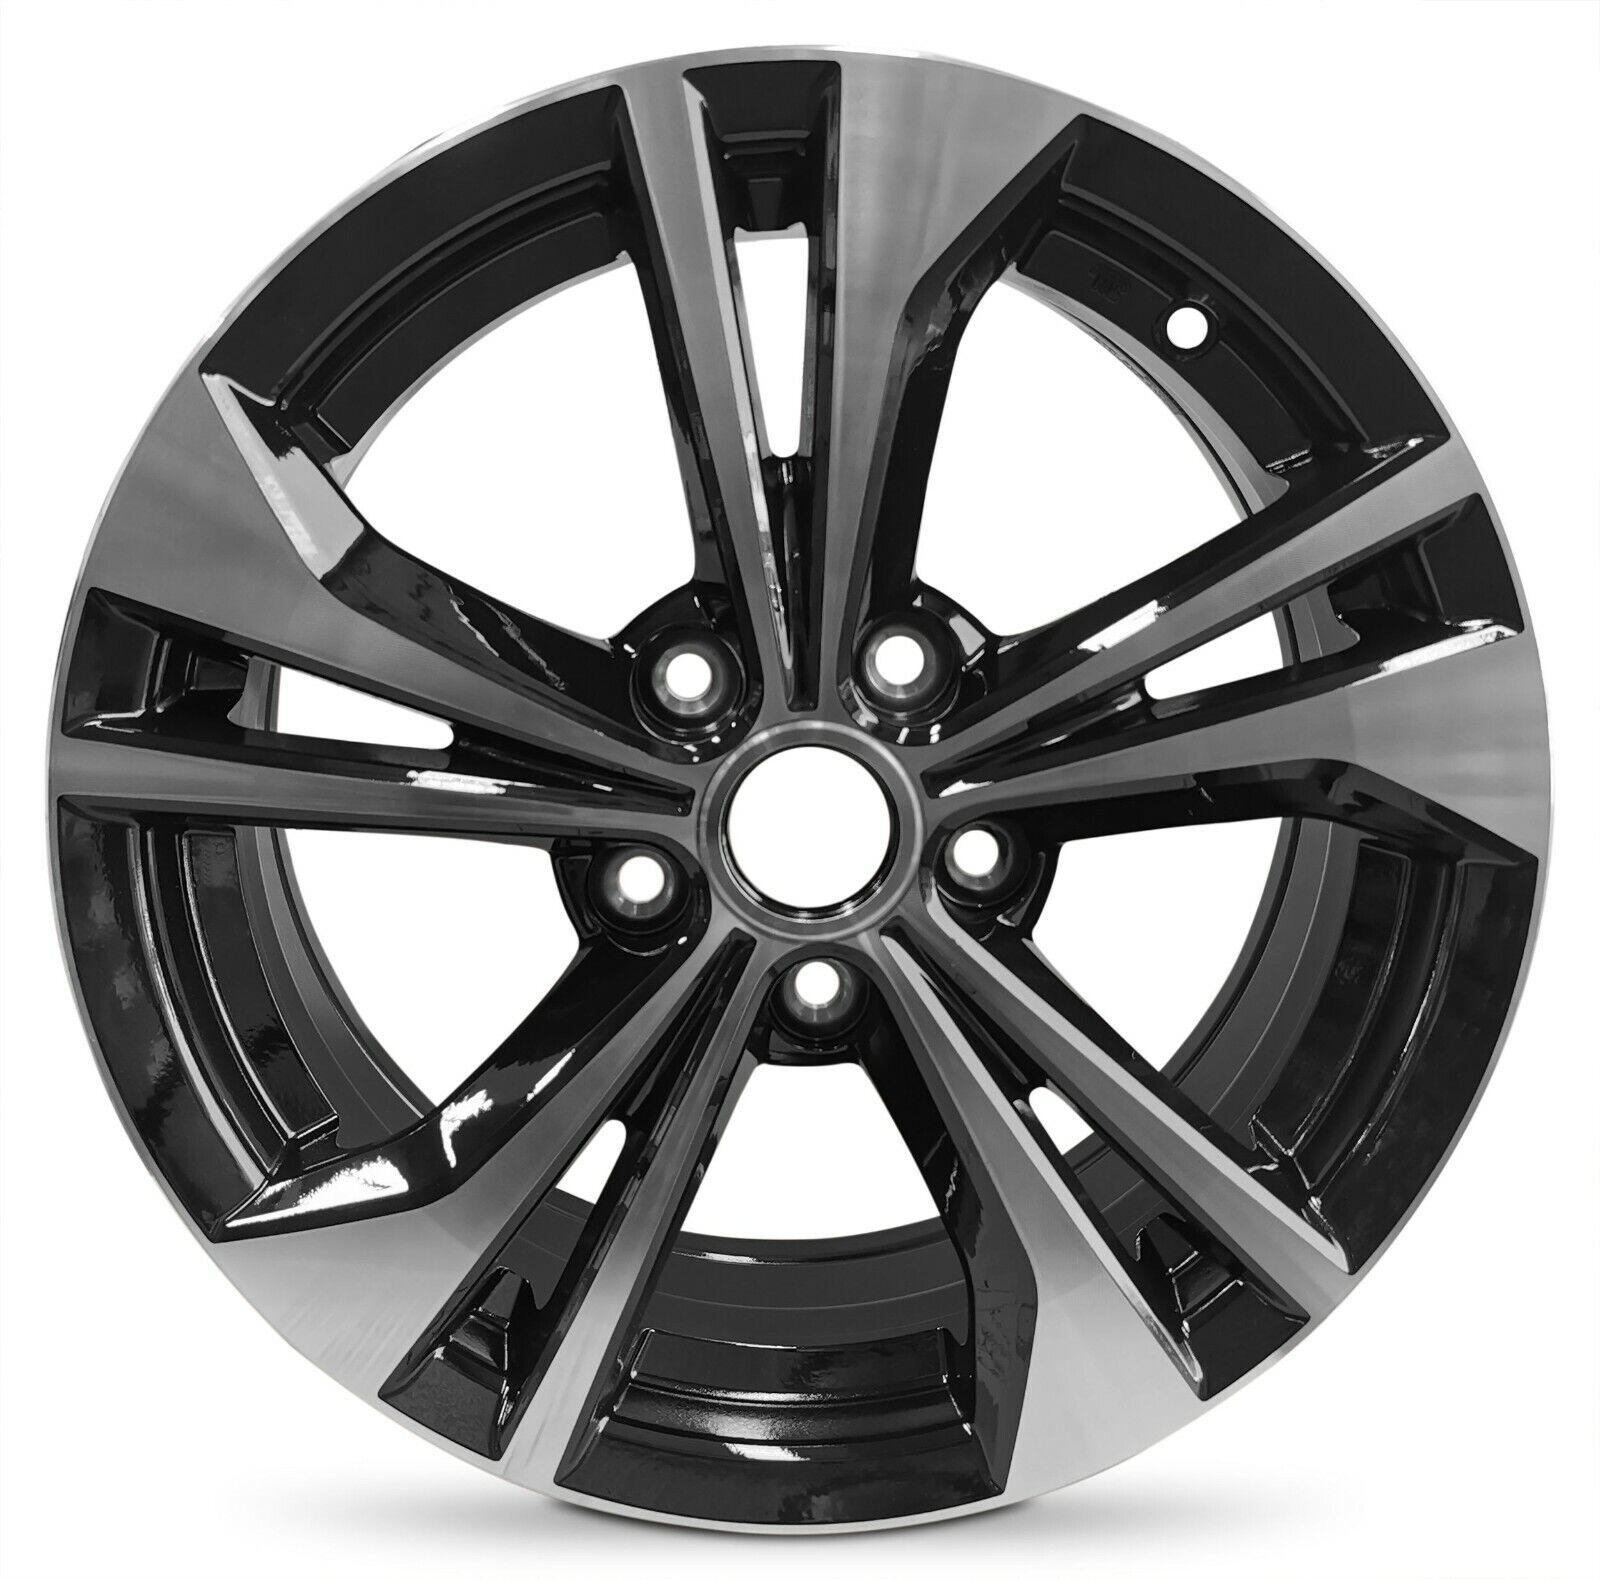 16 Inch Alloy Wheel Rim For 2020 Nissan Sentra Black Machined With 5 Lug 16x6 5 Ebay